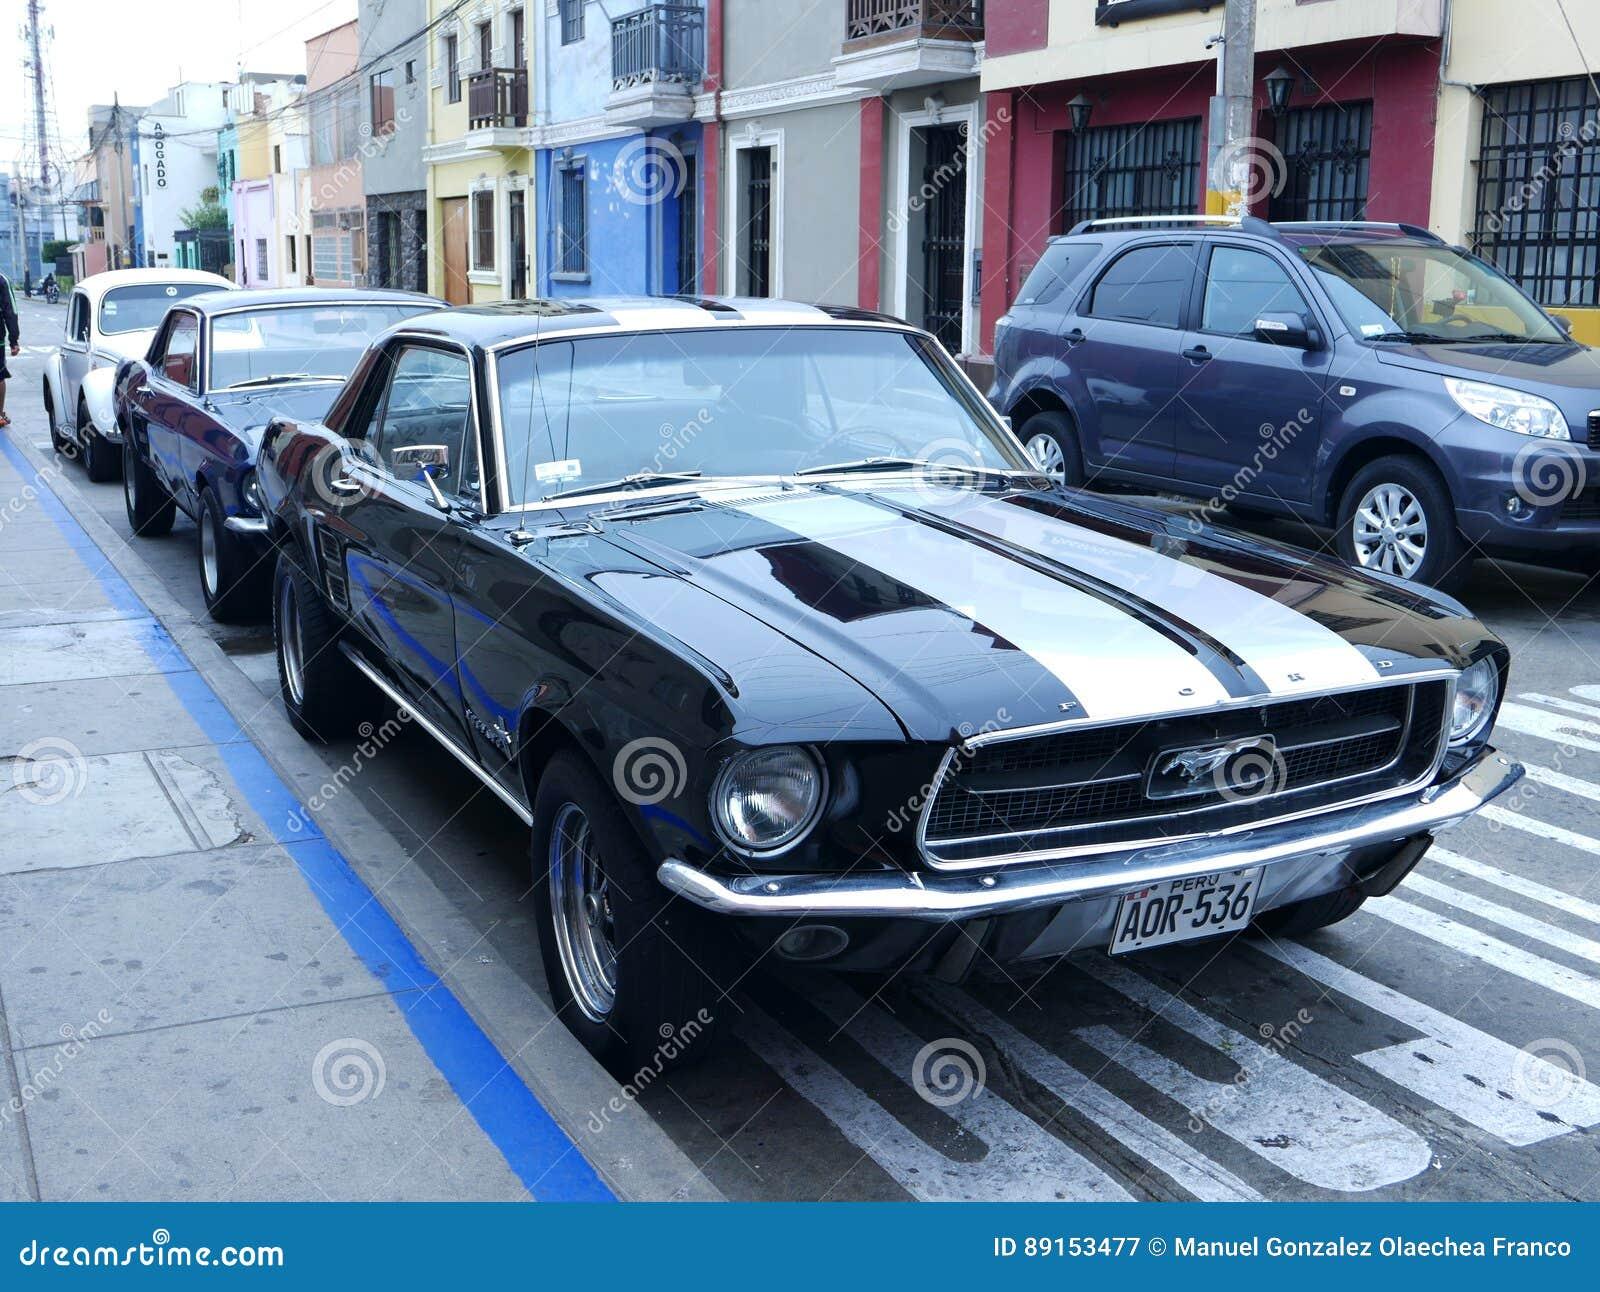 Ford Mustang 1969 Peru